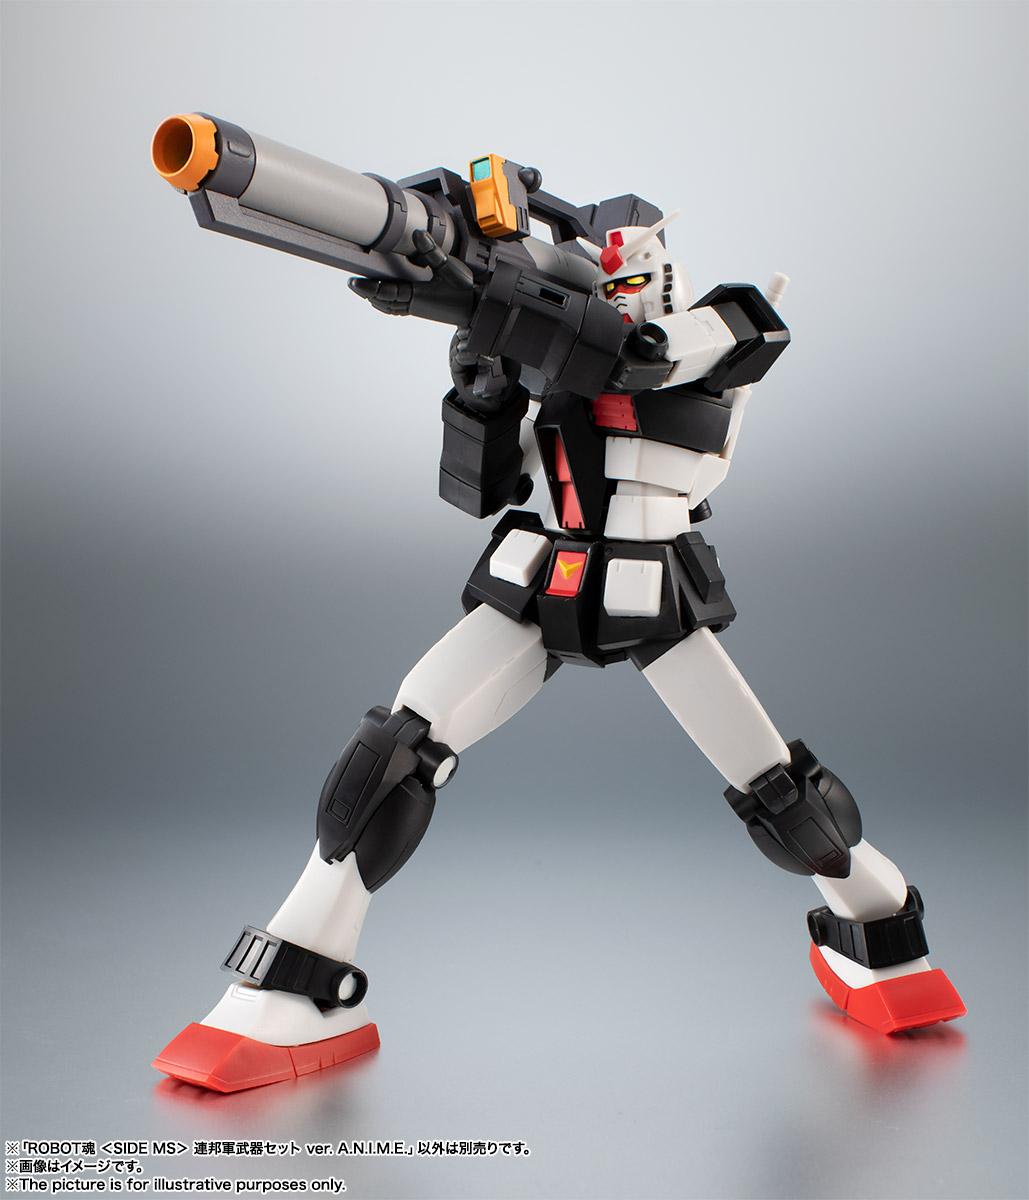 ROBOT魂〈SIDE MS〉『連邦軍武器セット ver. A.N.I.M.E.』ガンダム 完成品フィギュア-010